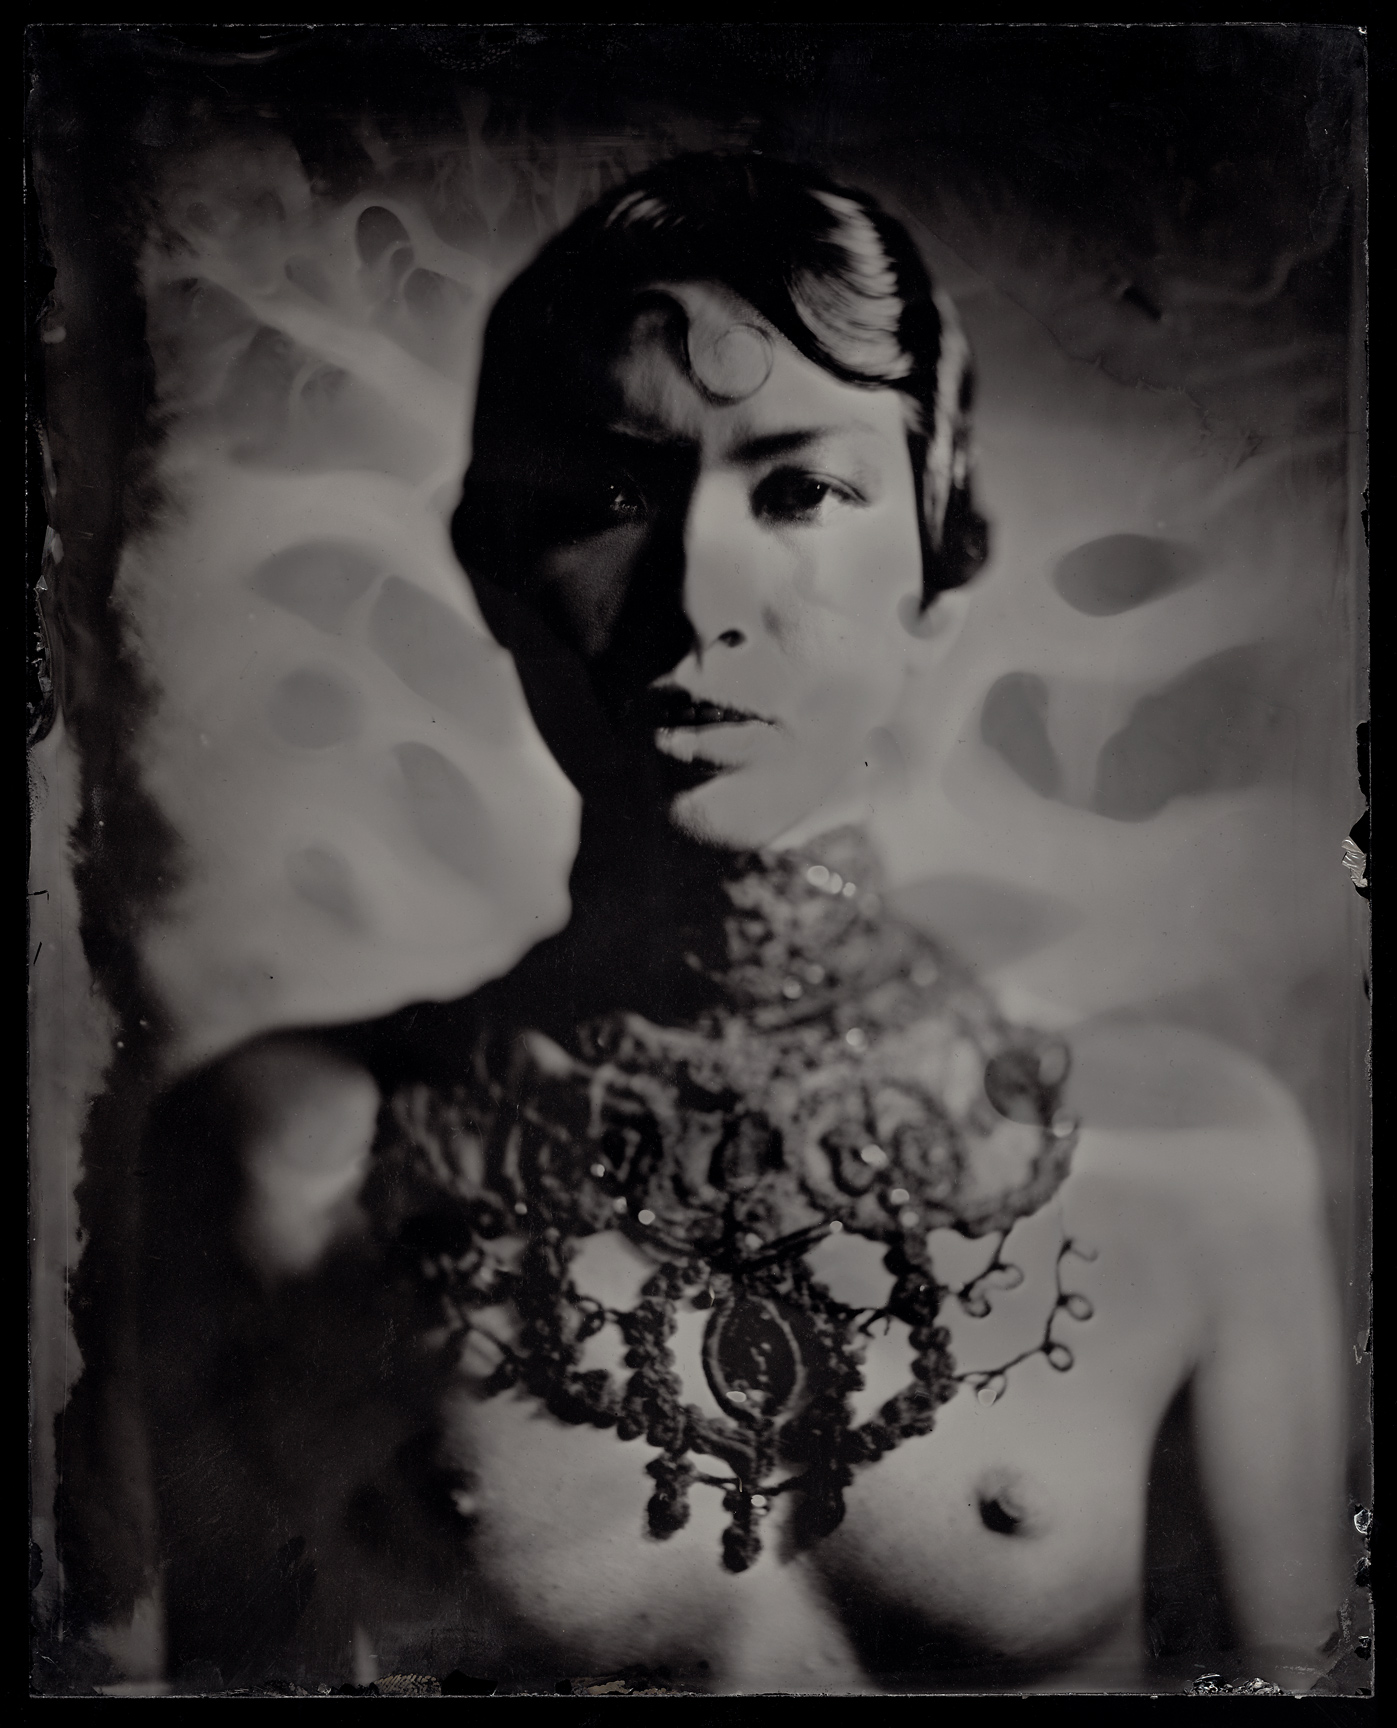 photographer-james-weber-wetplate-collodion-13418.jpg